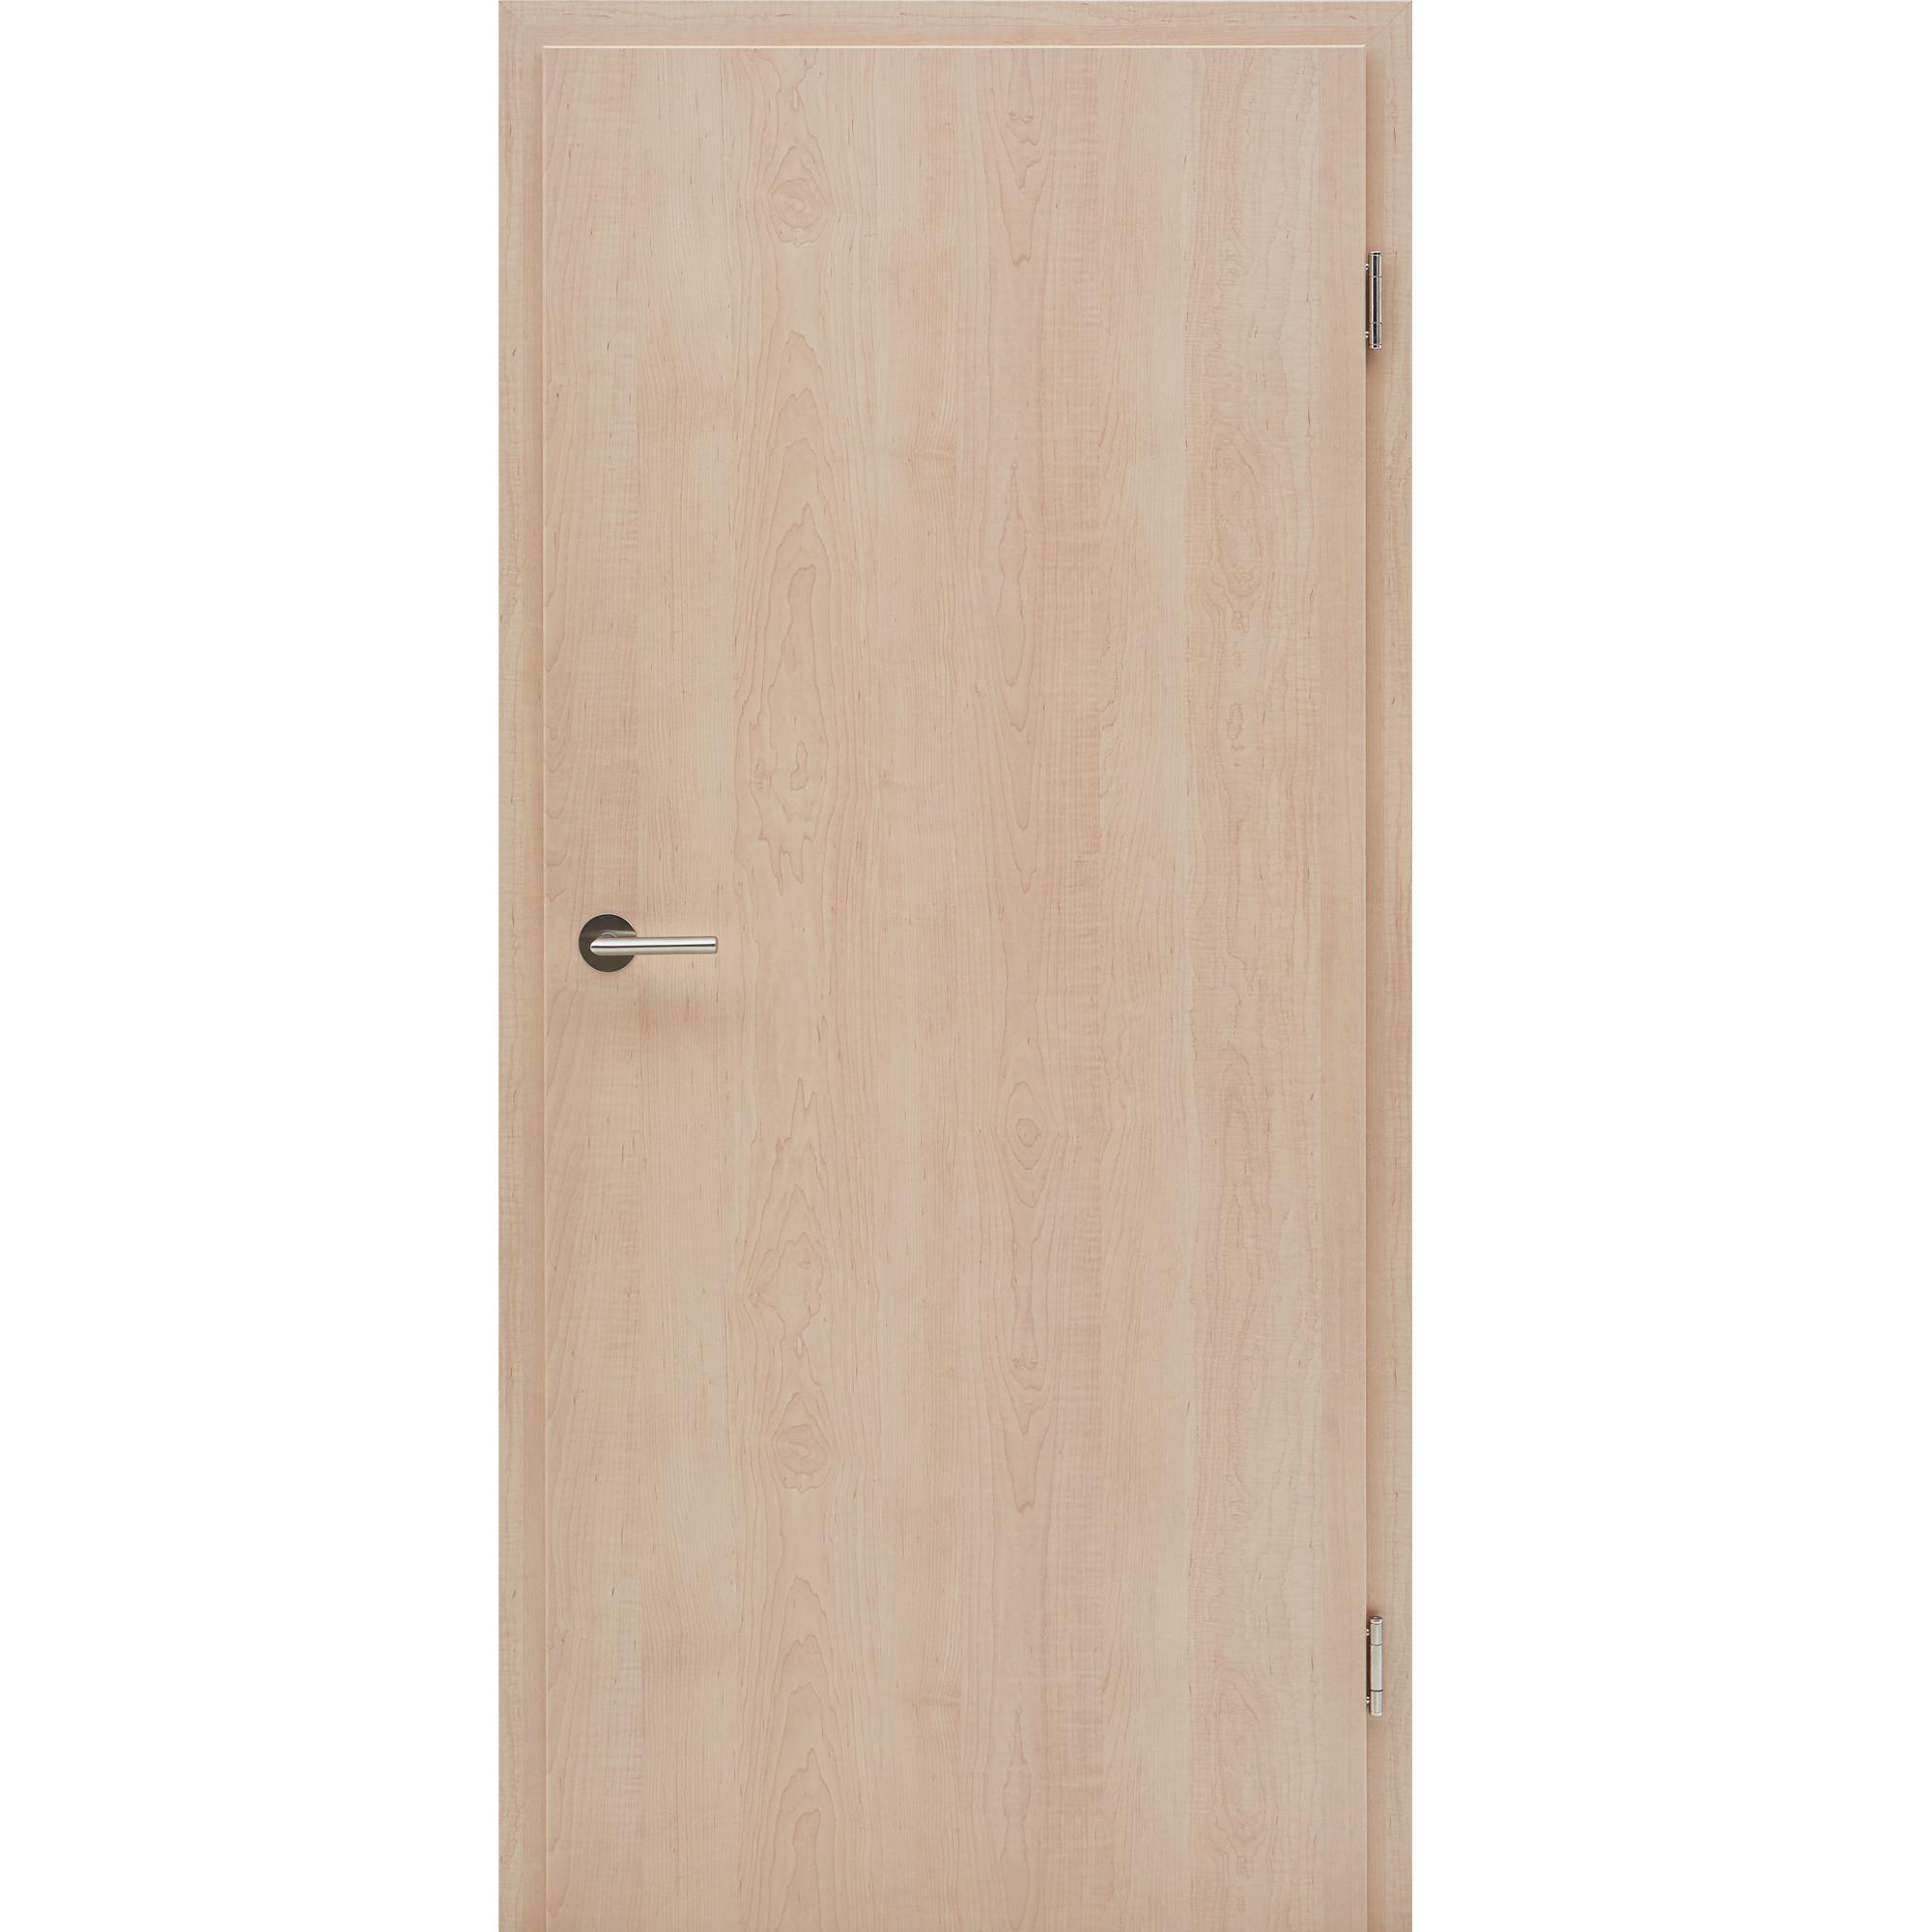 wohnungst r mit zarge cpl nova ahorn vollspan kkl ii 27db. Black Bedroom Furniture Sets. Home Design Ideas